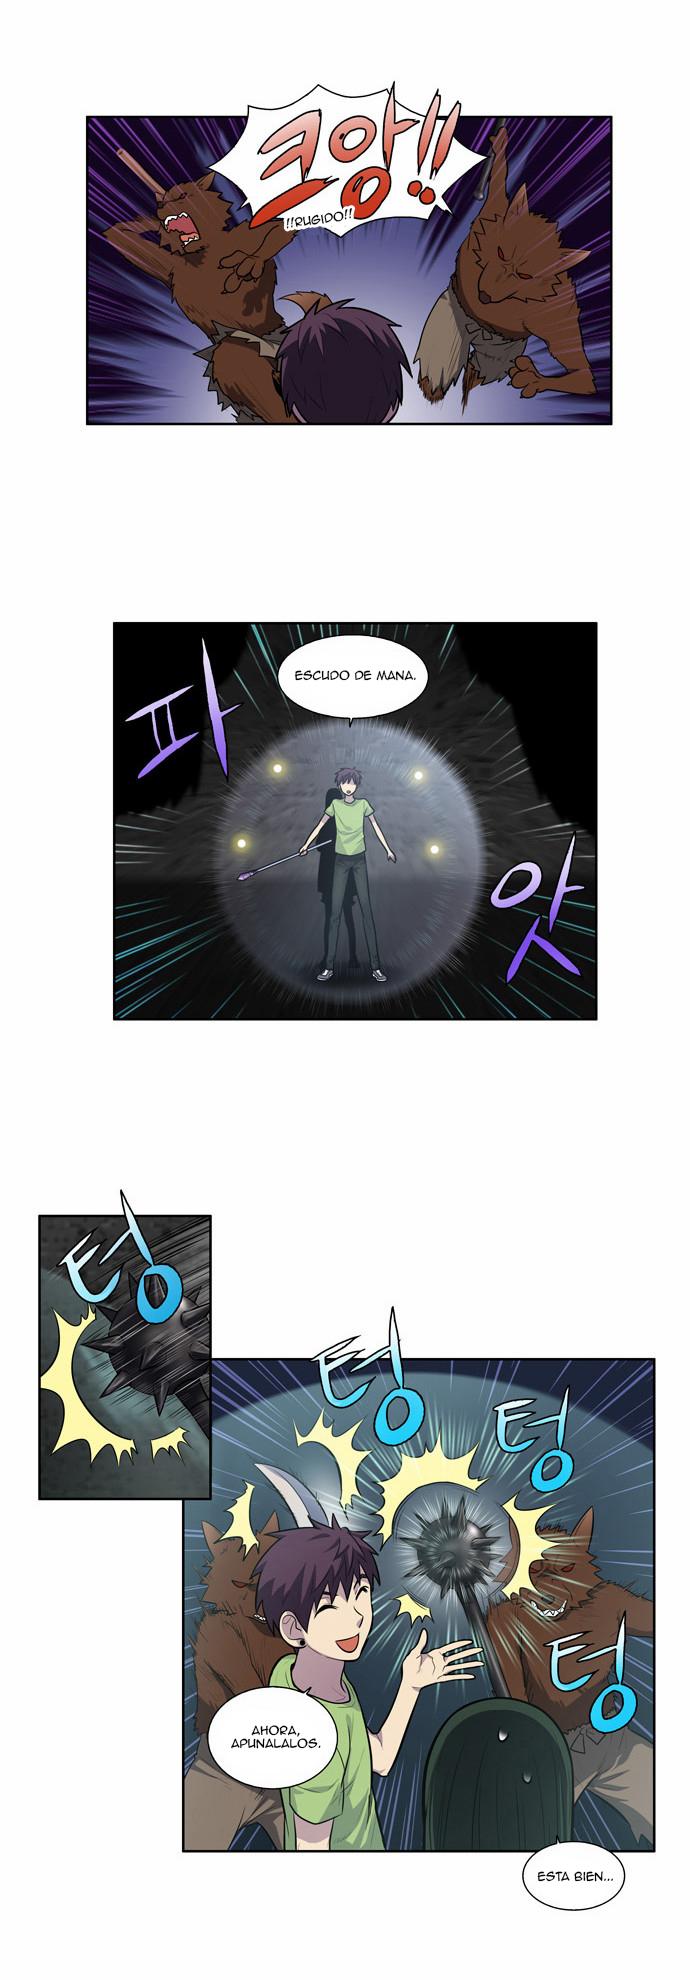 https://c5.ninemanga.com/es_manga/61/1725/420675/0174dc5fbdff12bf660e6be09f2aa9ad.jpg Page 11